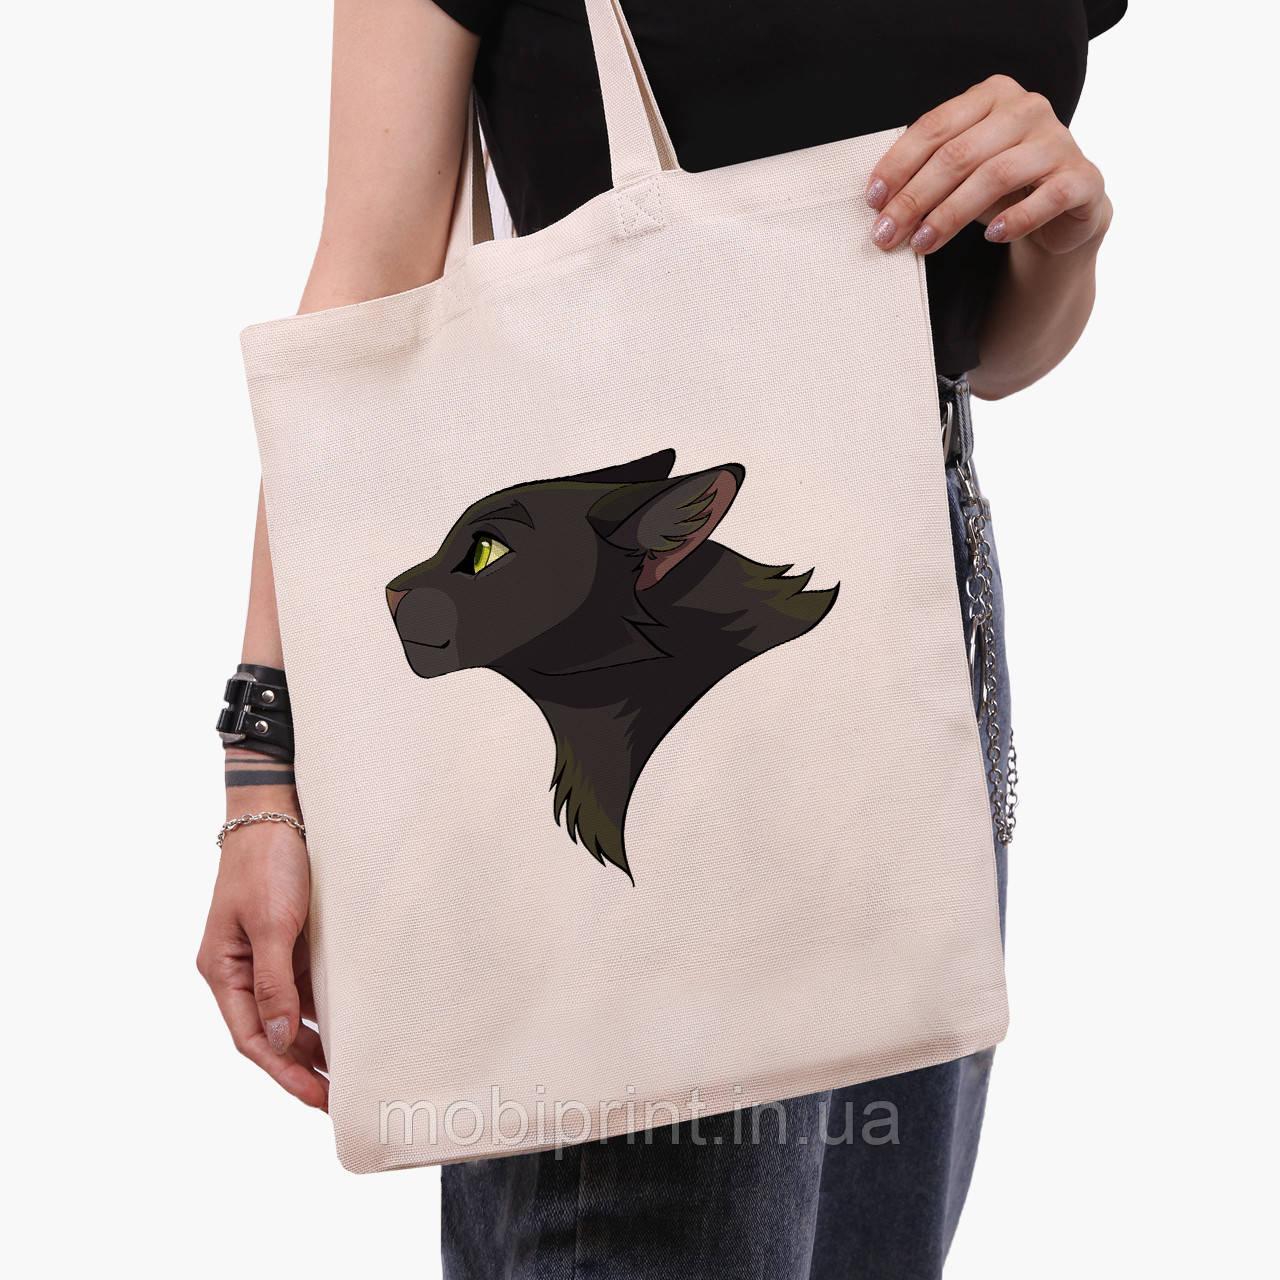 Еко сумка шоппер Чорна пантера (Black panther) (9227-2844) 41*35 см